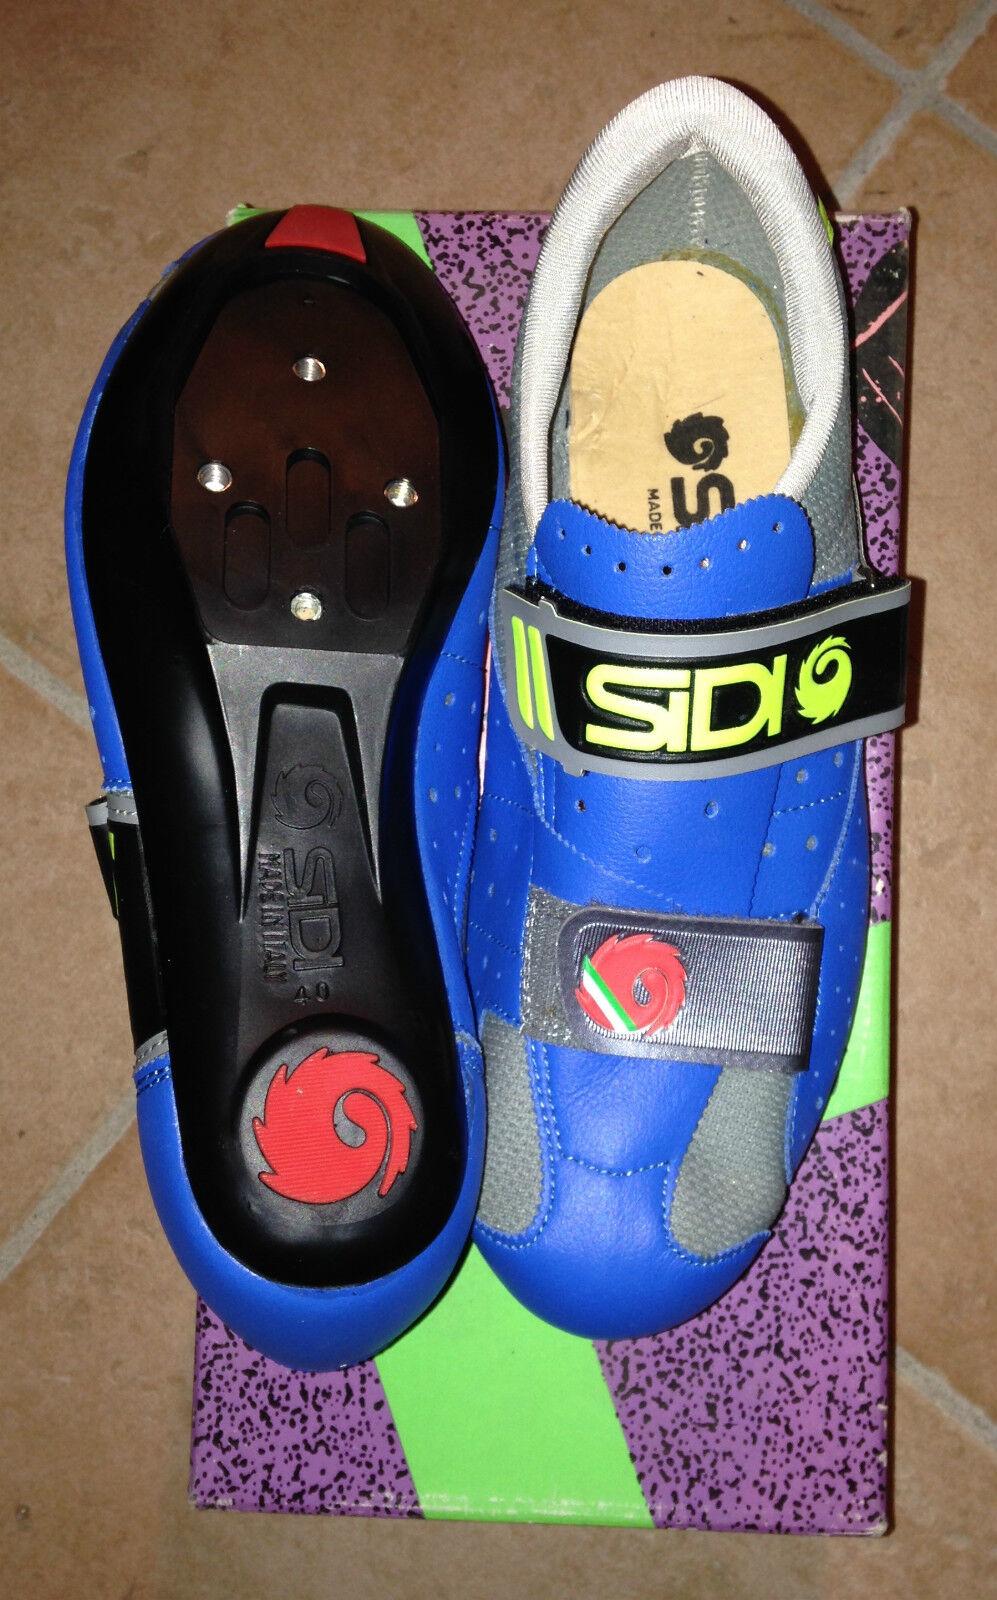 Schuhe Bici corsa Sidi Sirio Road Bike Schuhes Schuhes Schuhes 39 40 42 made in  8a0b45